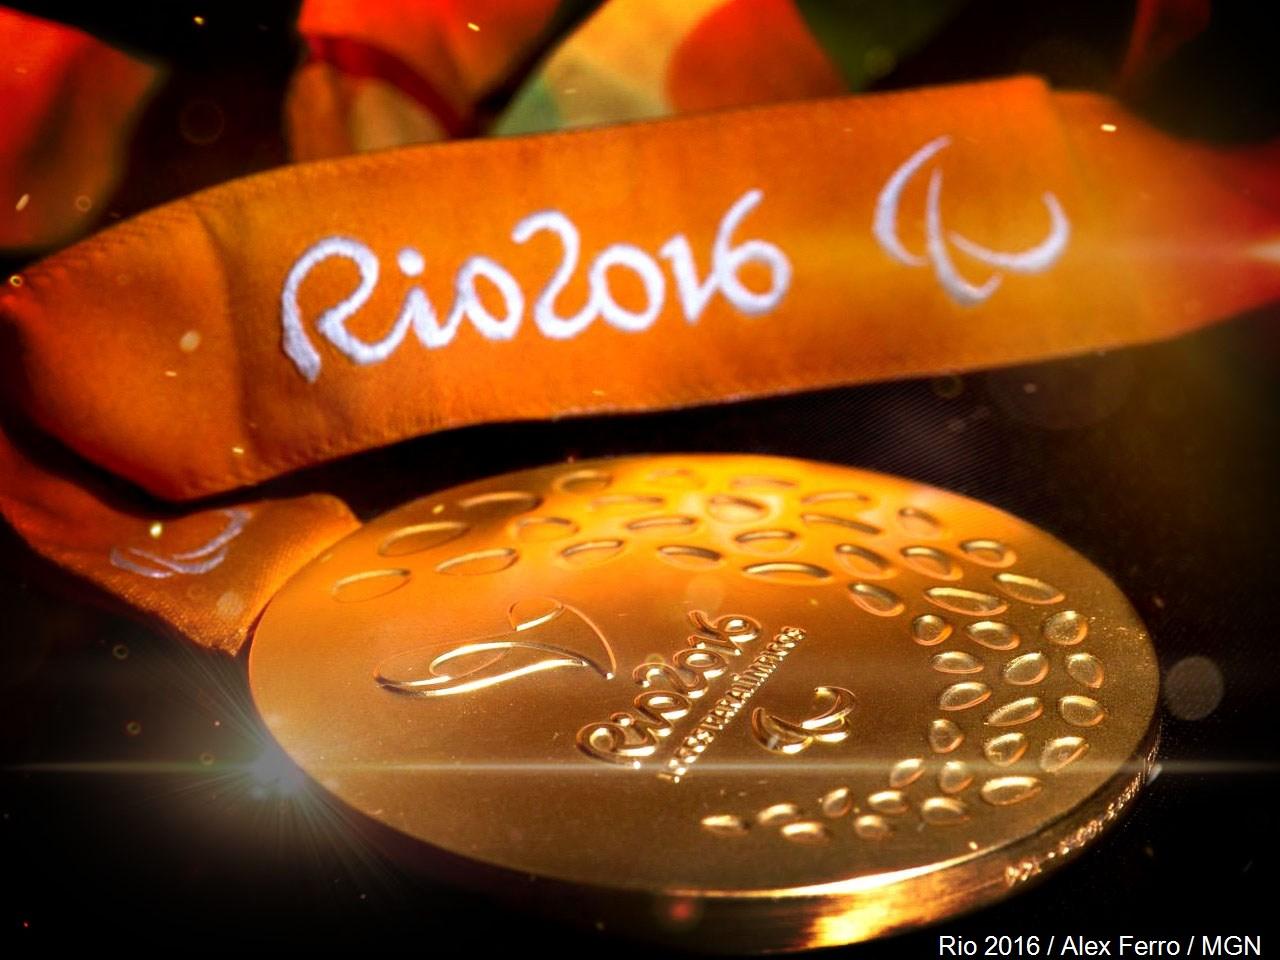 Rio 2016.jpg